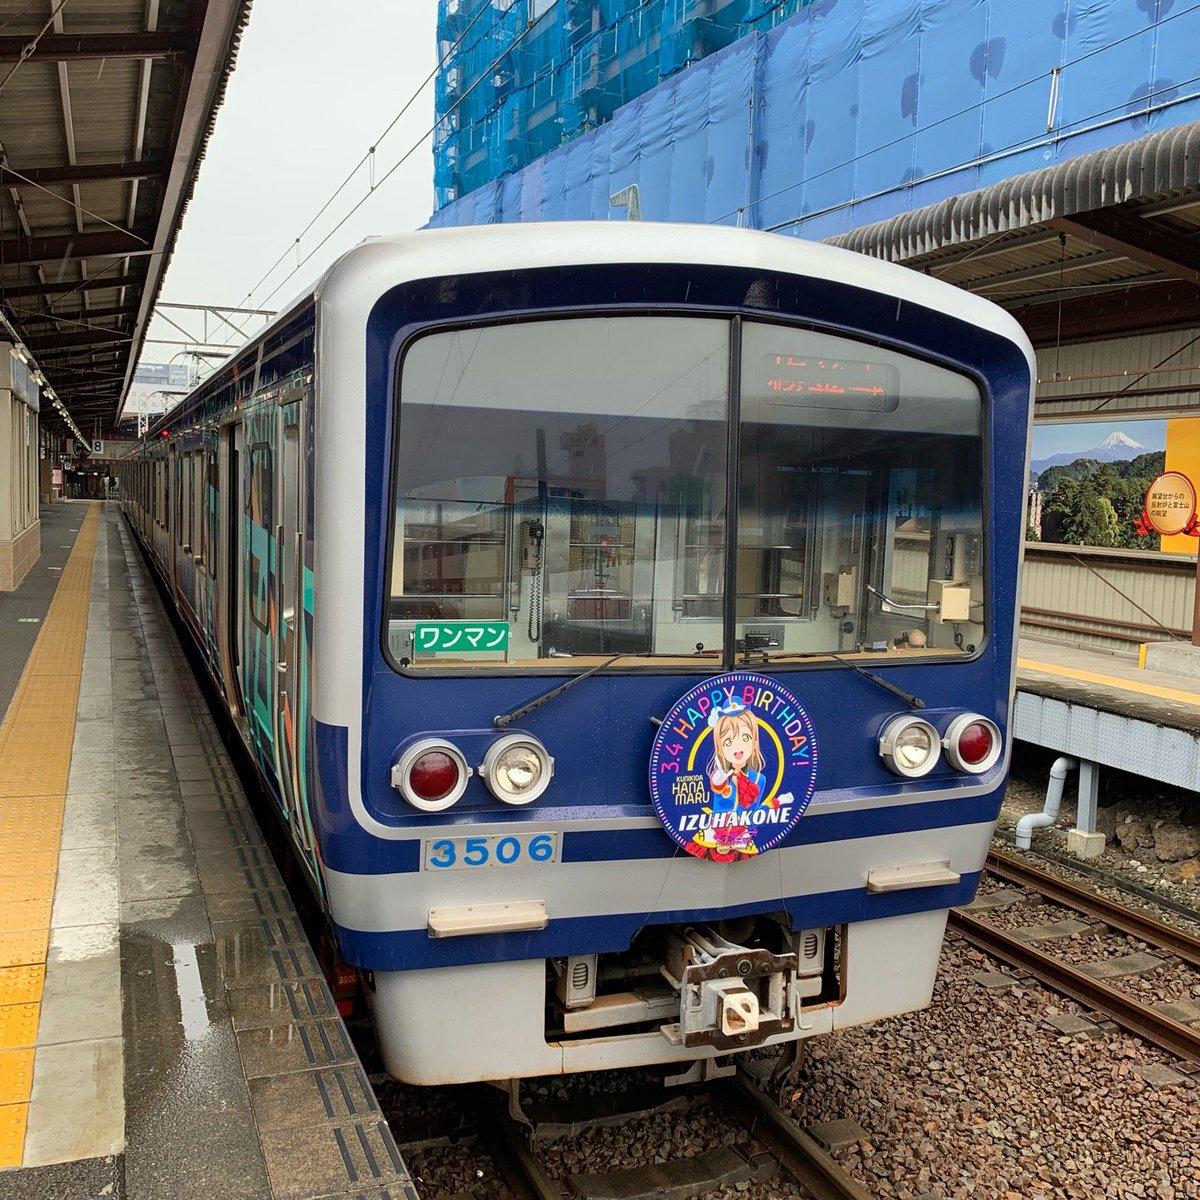 伊豆箱根鉄道 三島駅 HAPPY PARTY TRAIN号